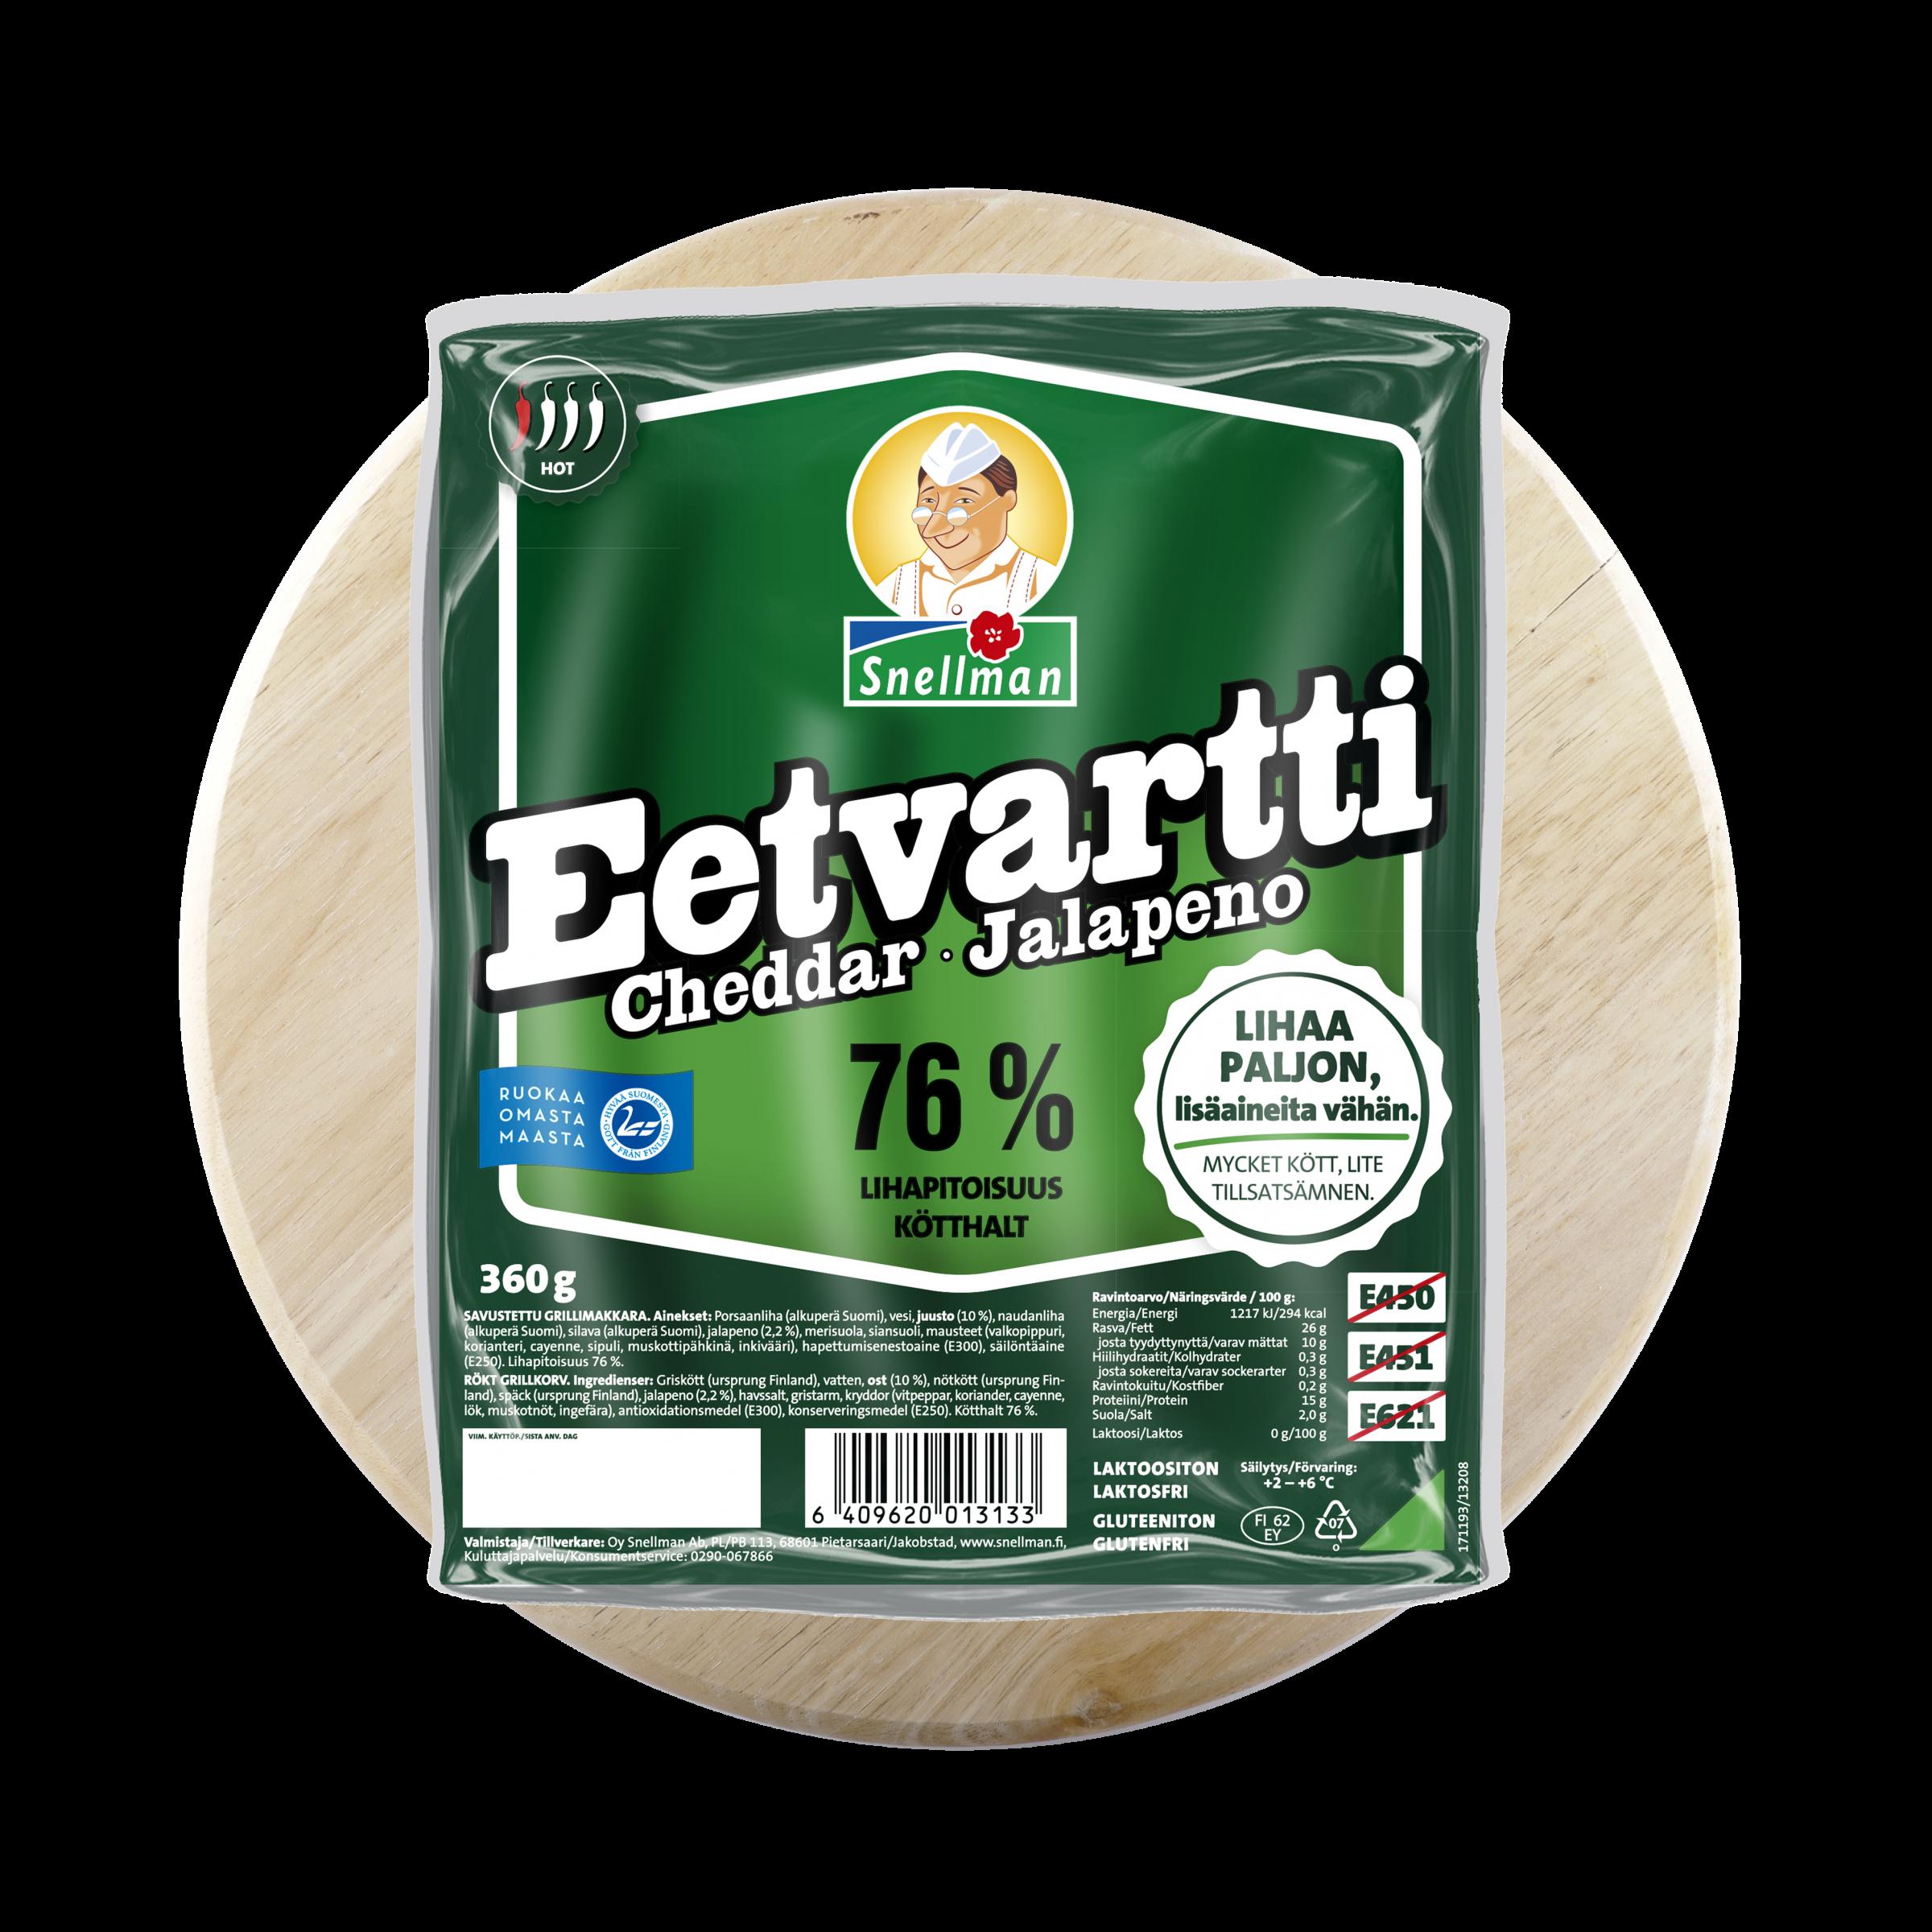 Cheddar Jalapeno Eetvartti